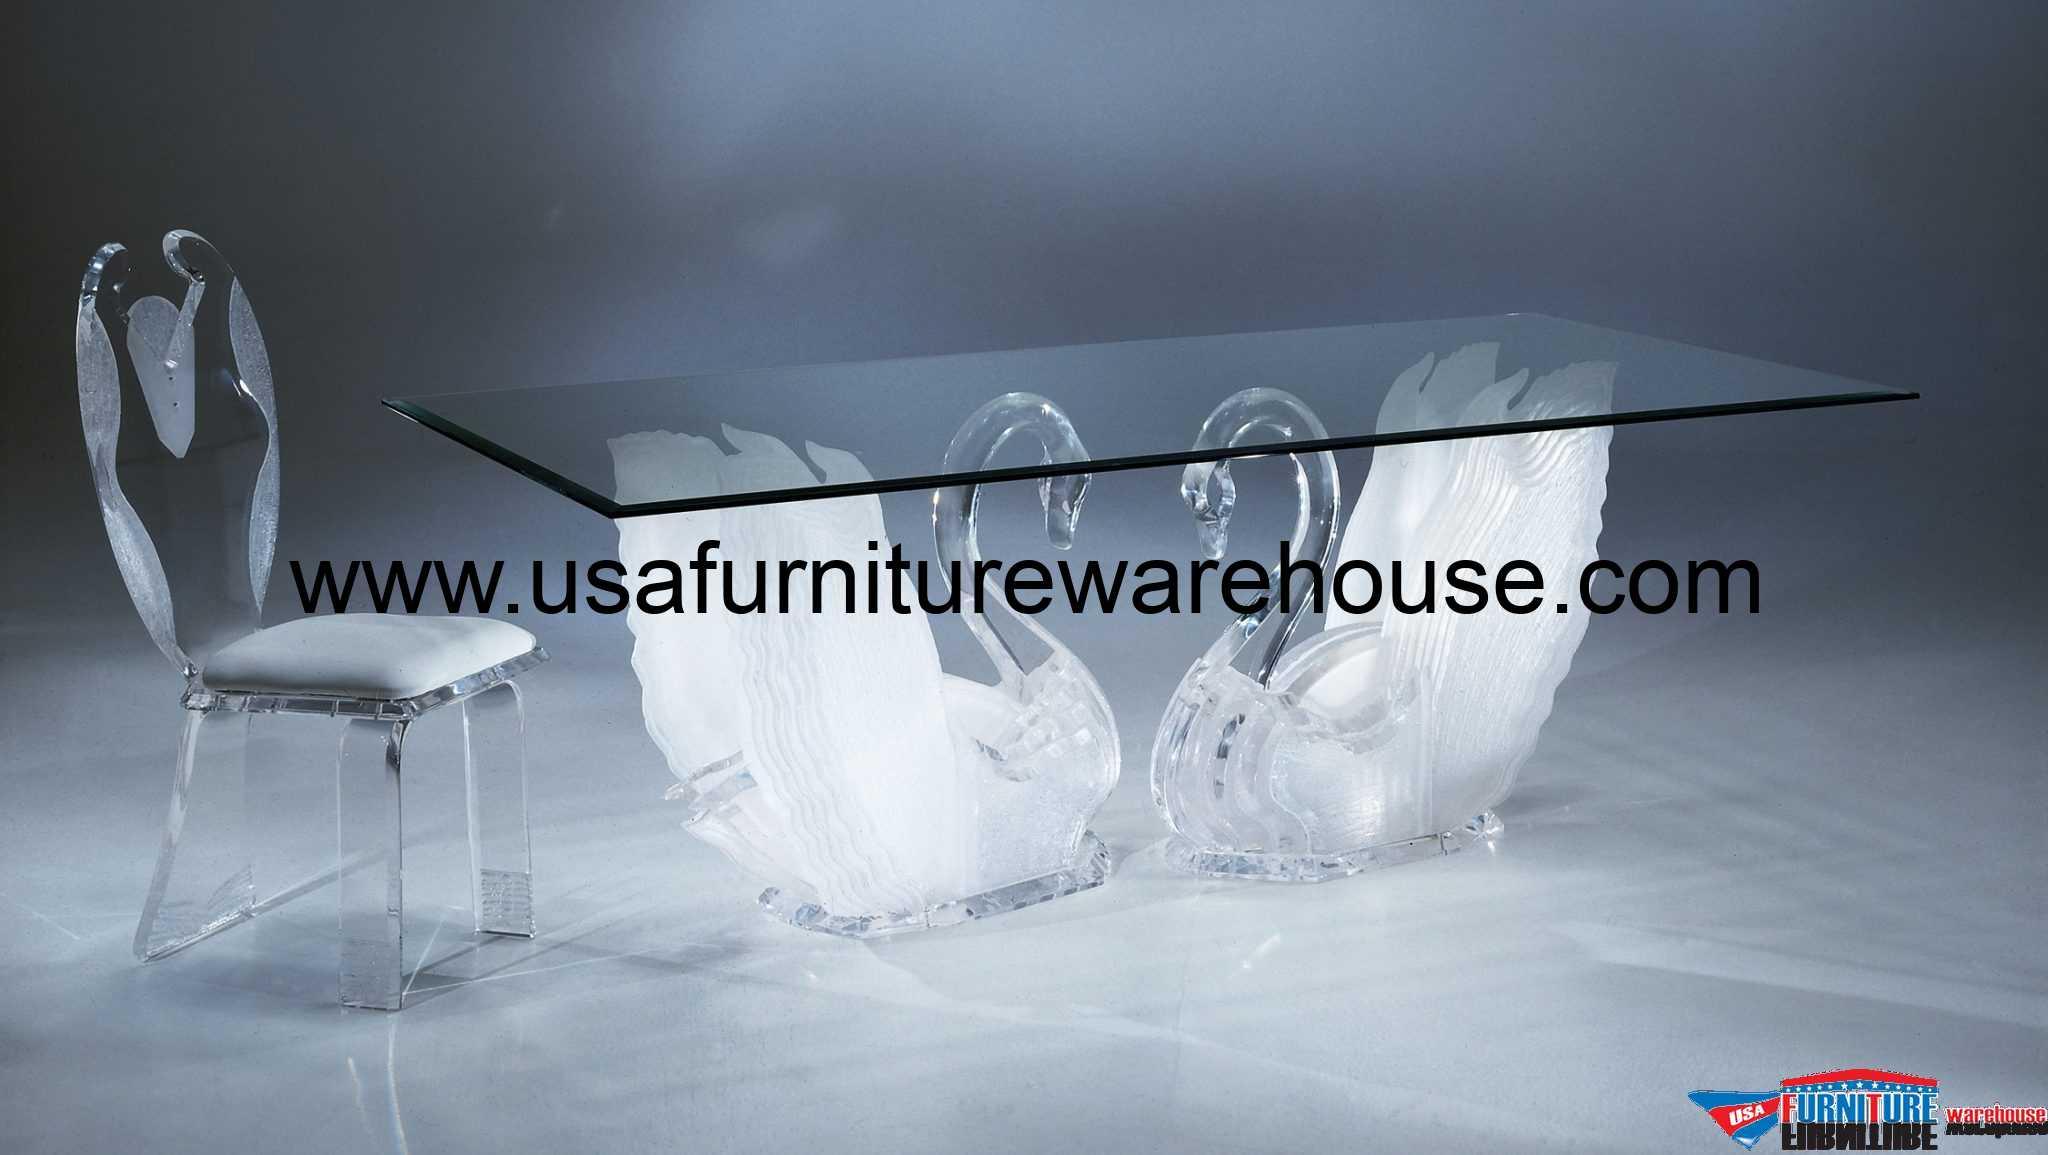 Dining Table - USAFurniturewarehouse.com